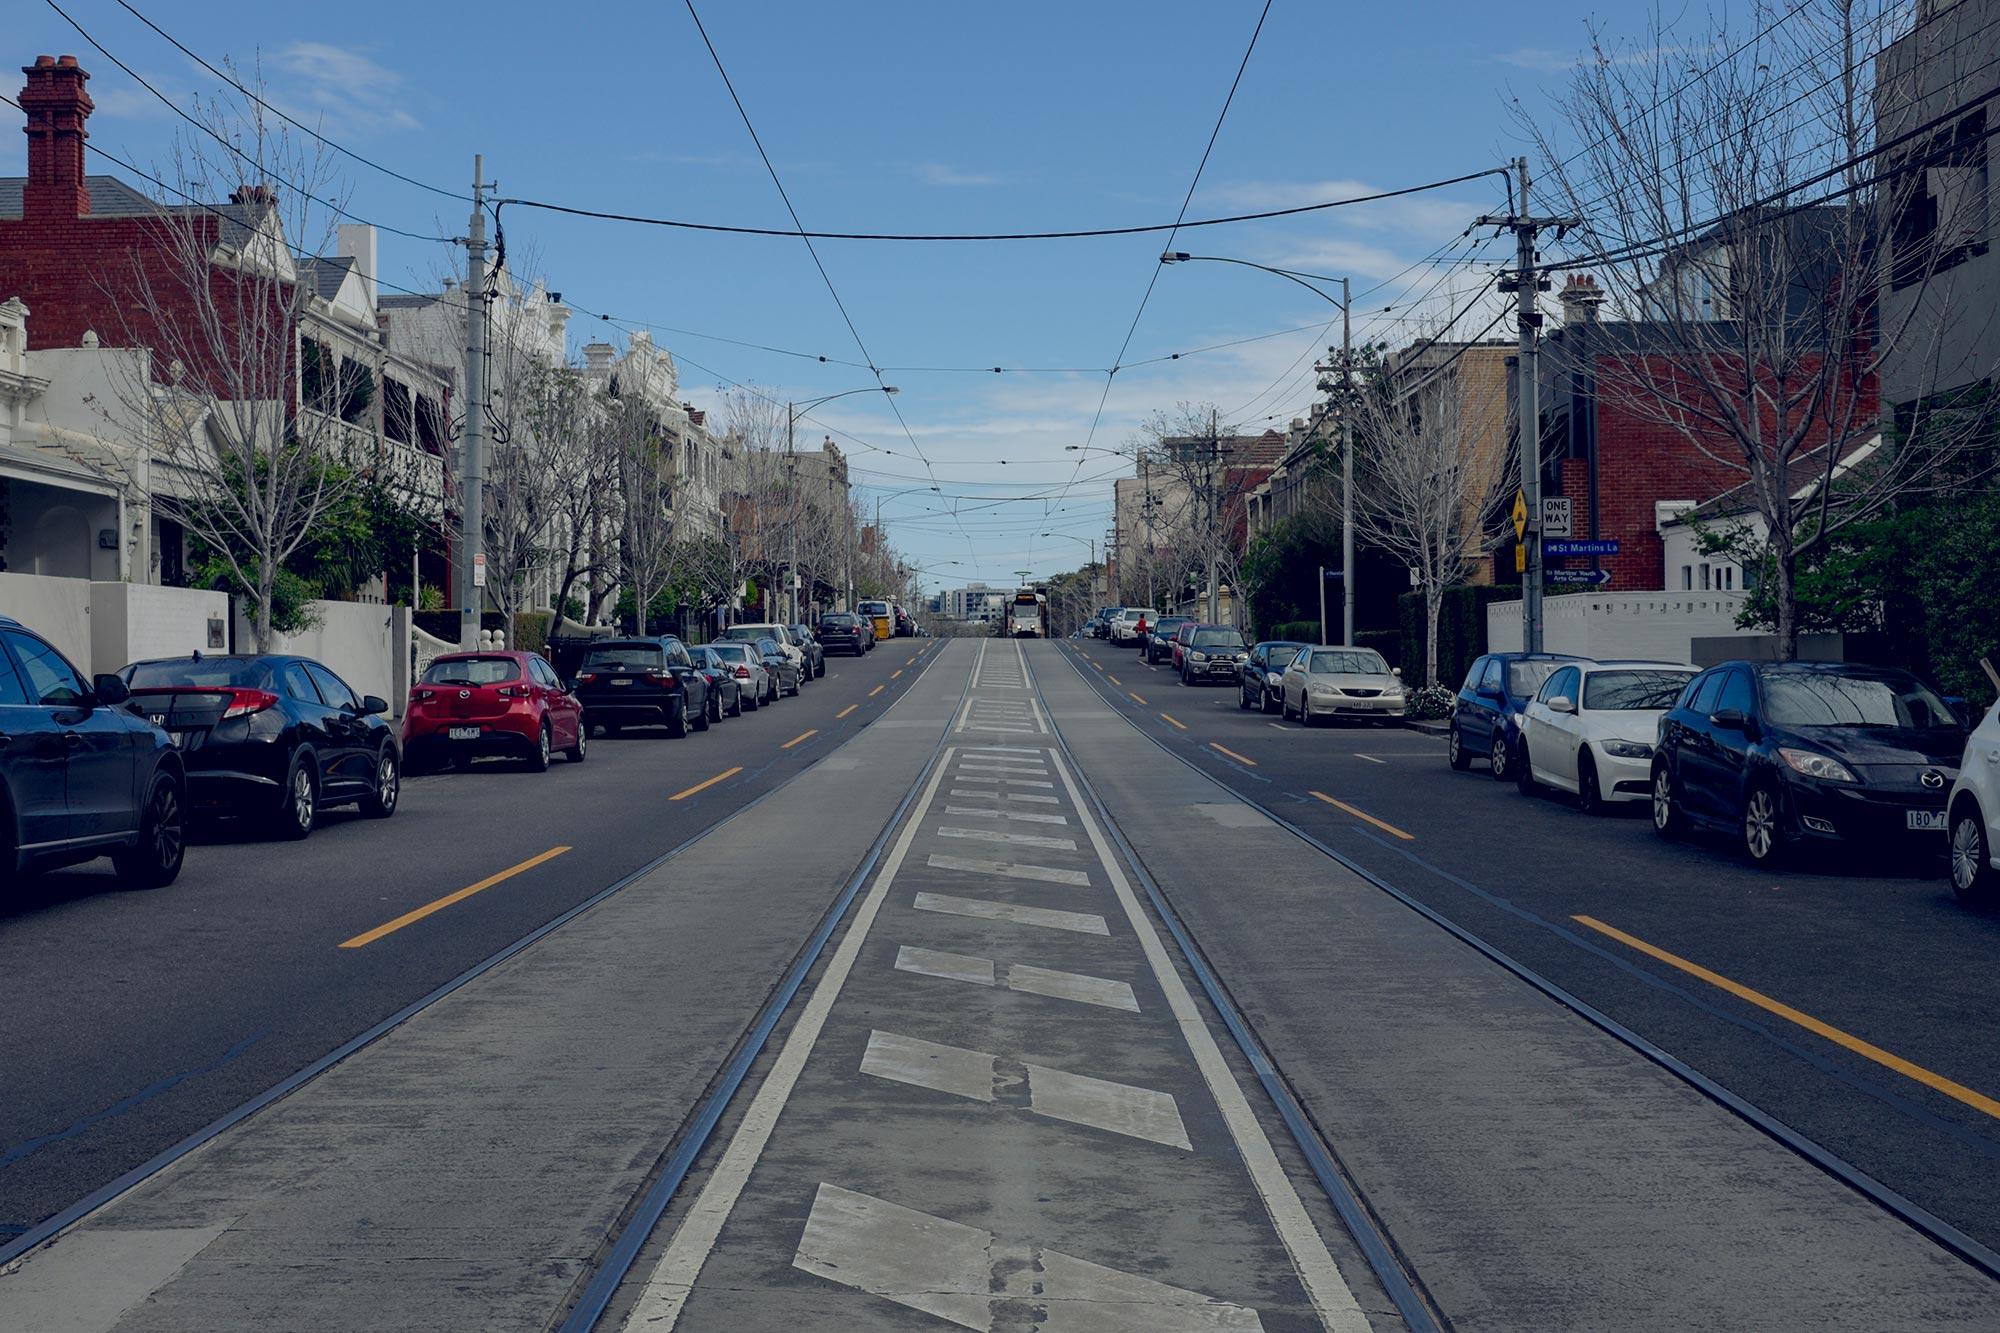 australia-melbourne-south-yarra-park-street2